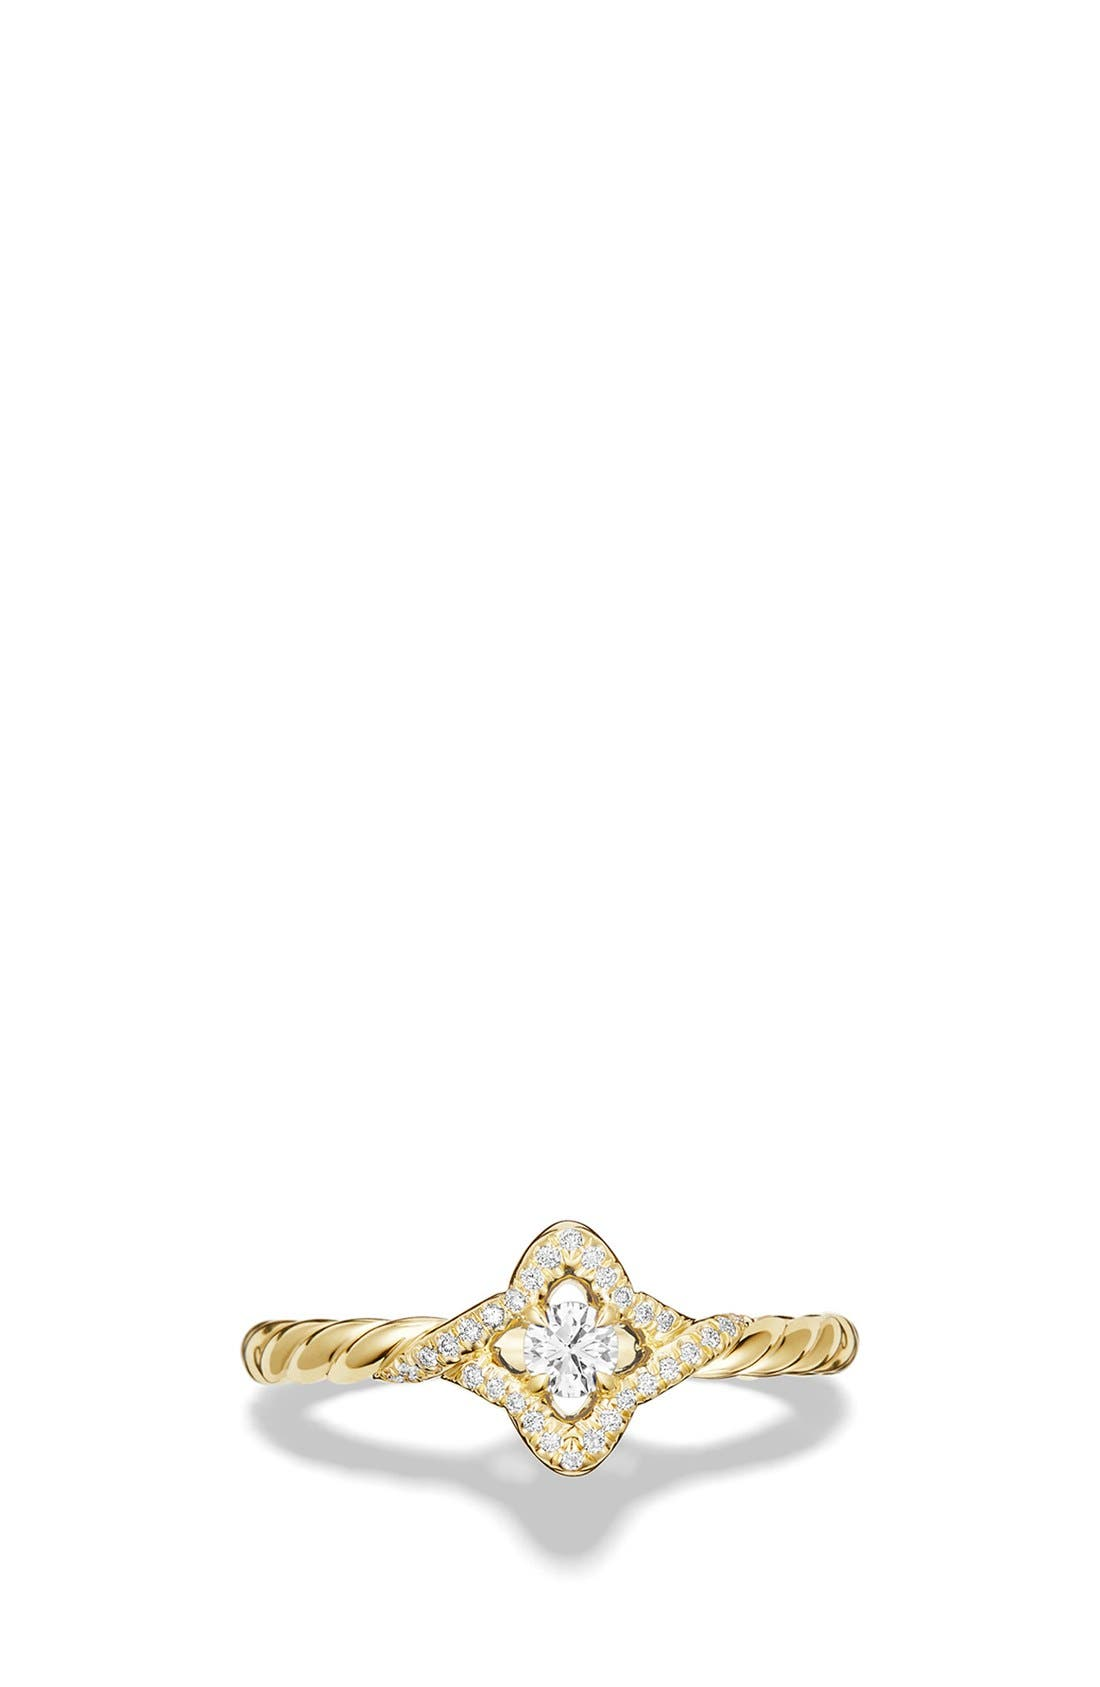 'Venetian Quatrefoil' Ring with Diamonds,                             Alternate thumbnail 4, color,                             YELLOW GOLD